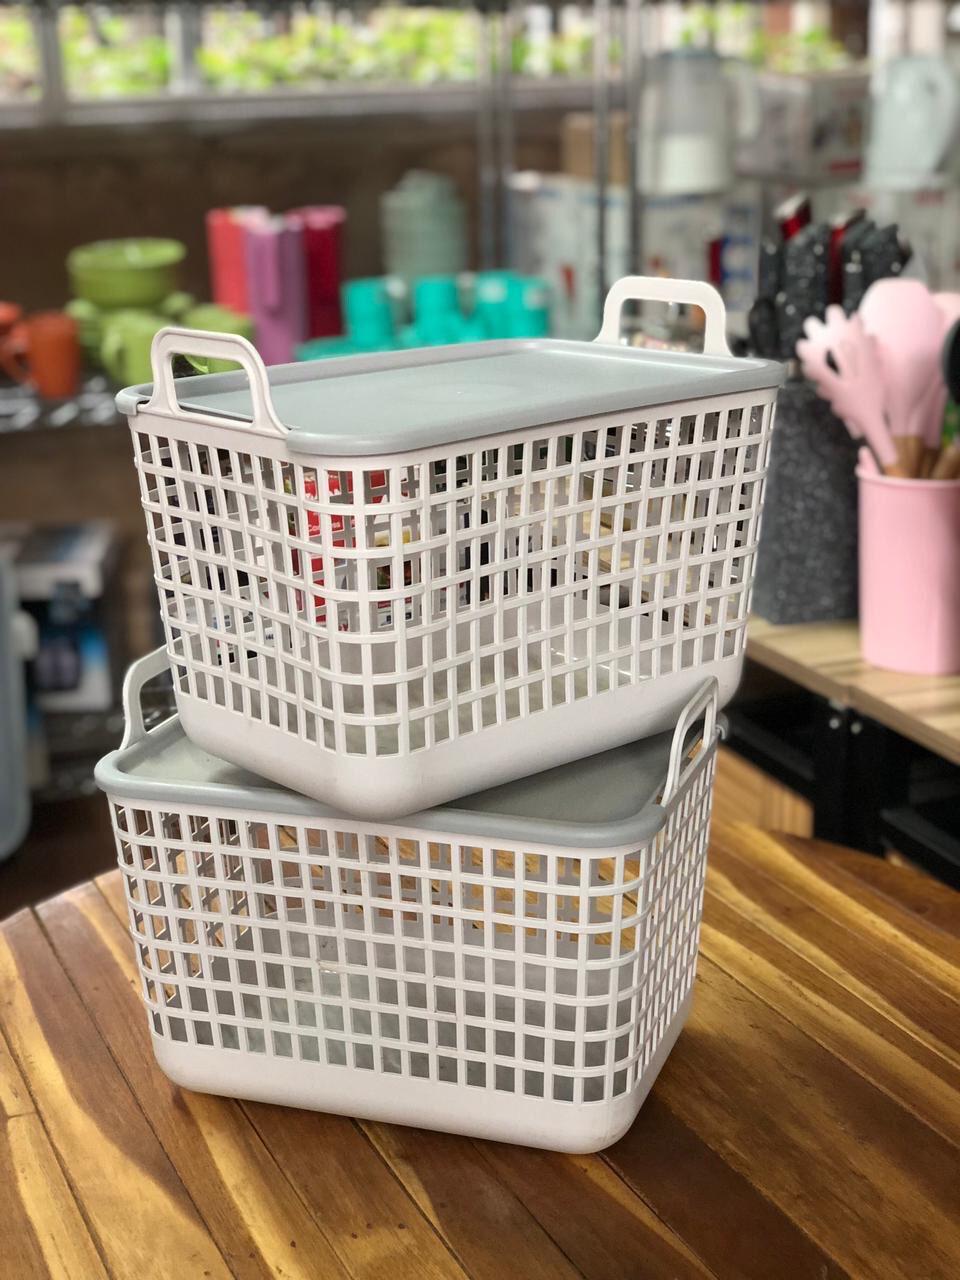 Basket Organiser Set of 2, picnic basket, Storage basket small 11